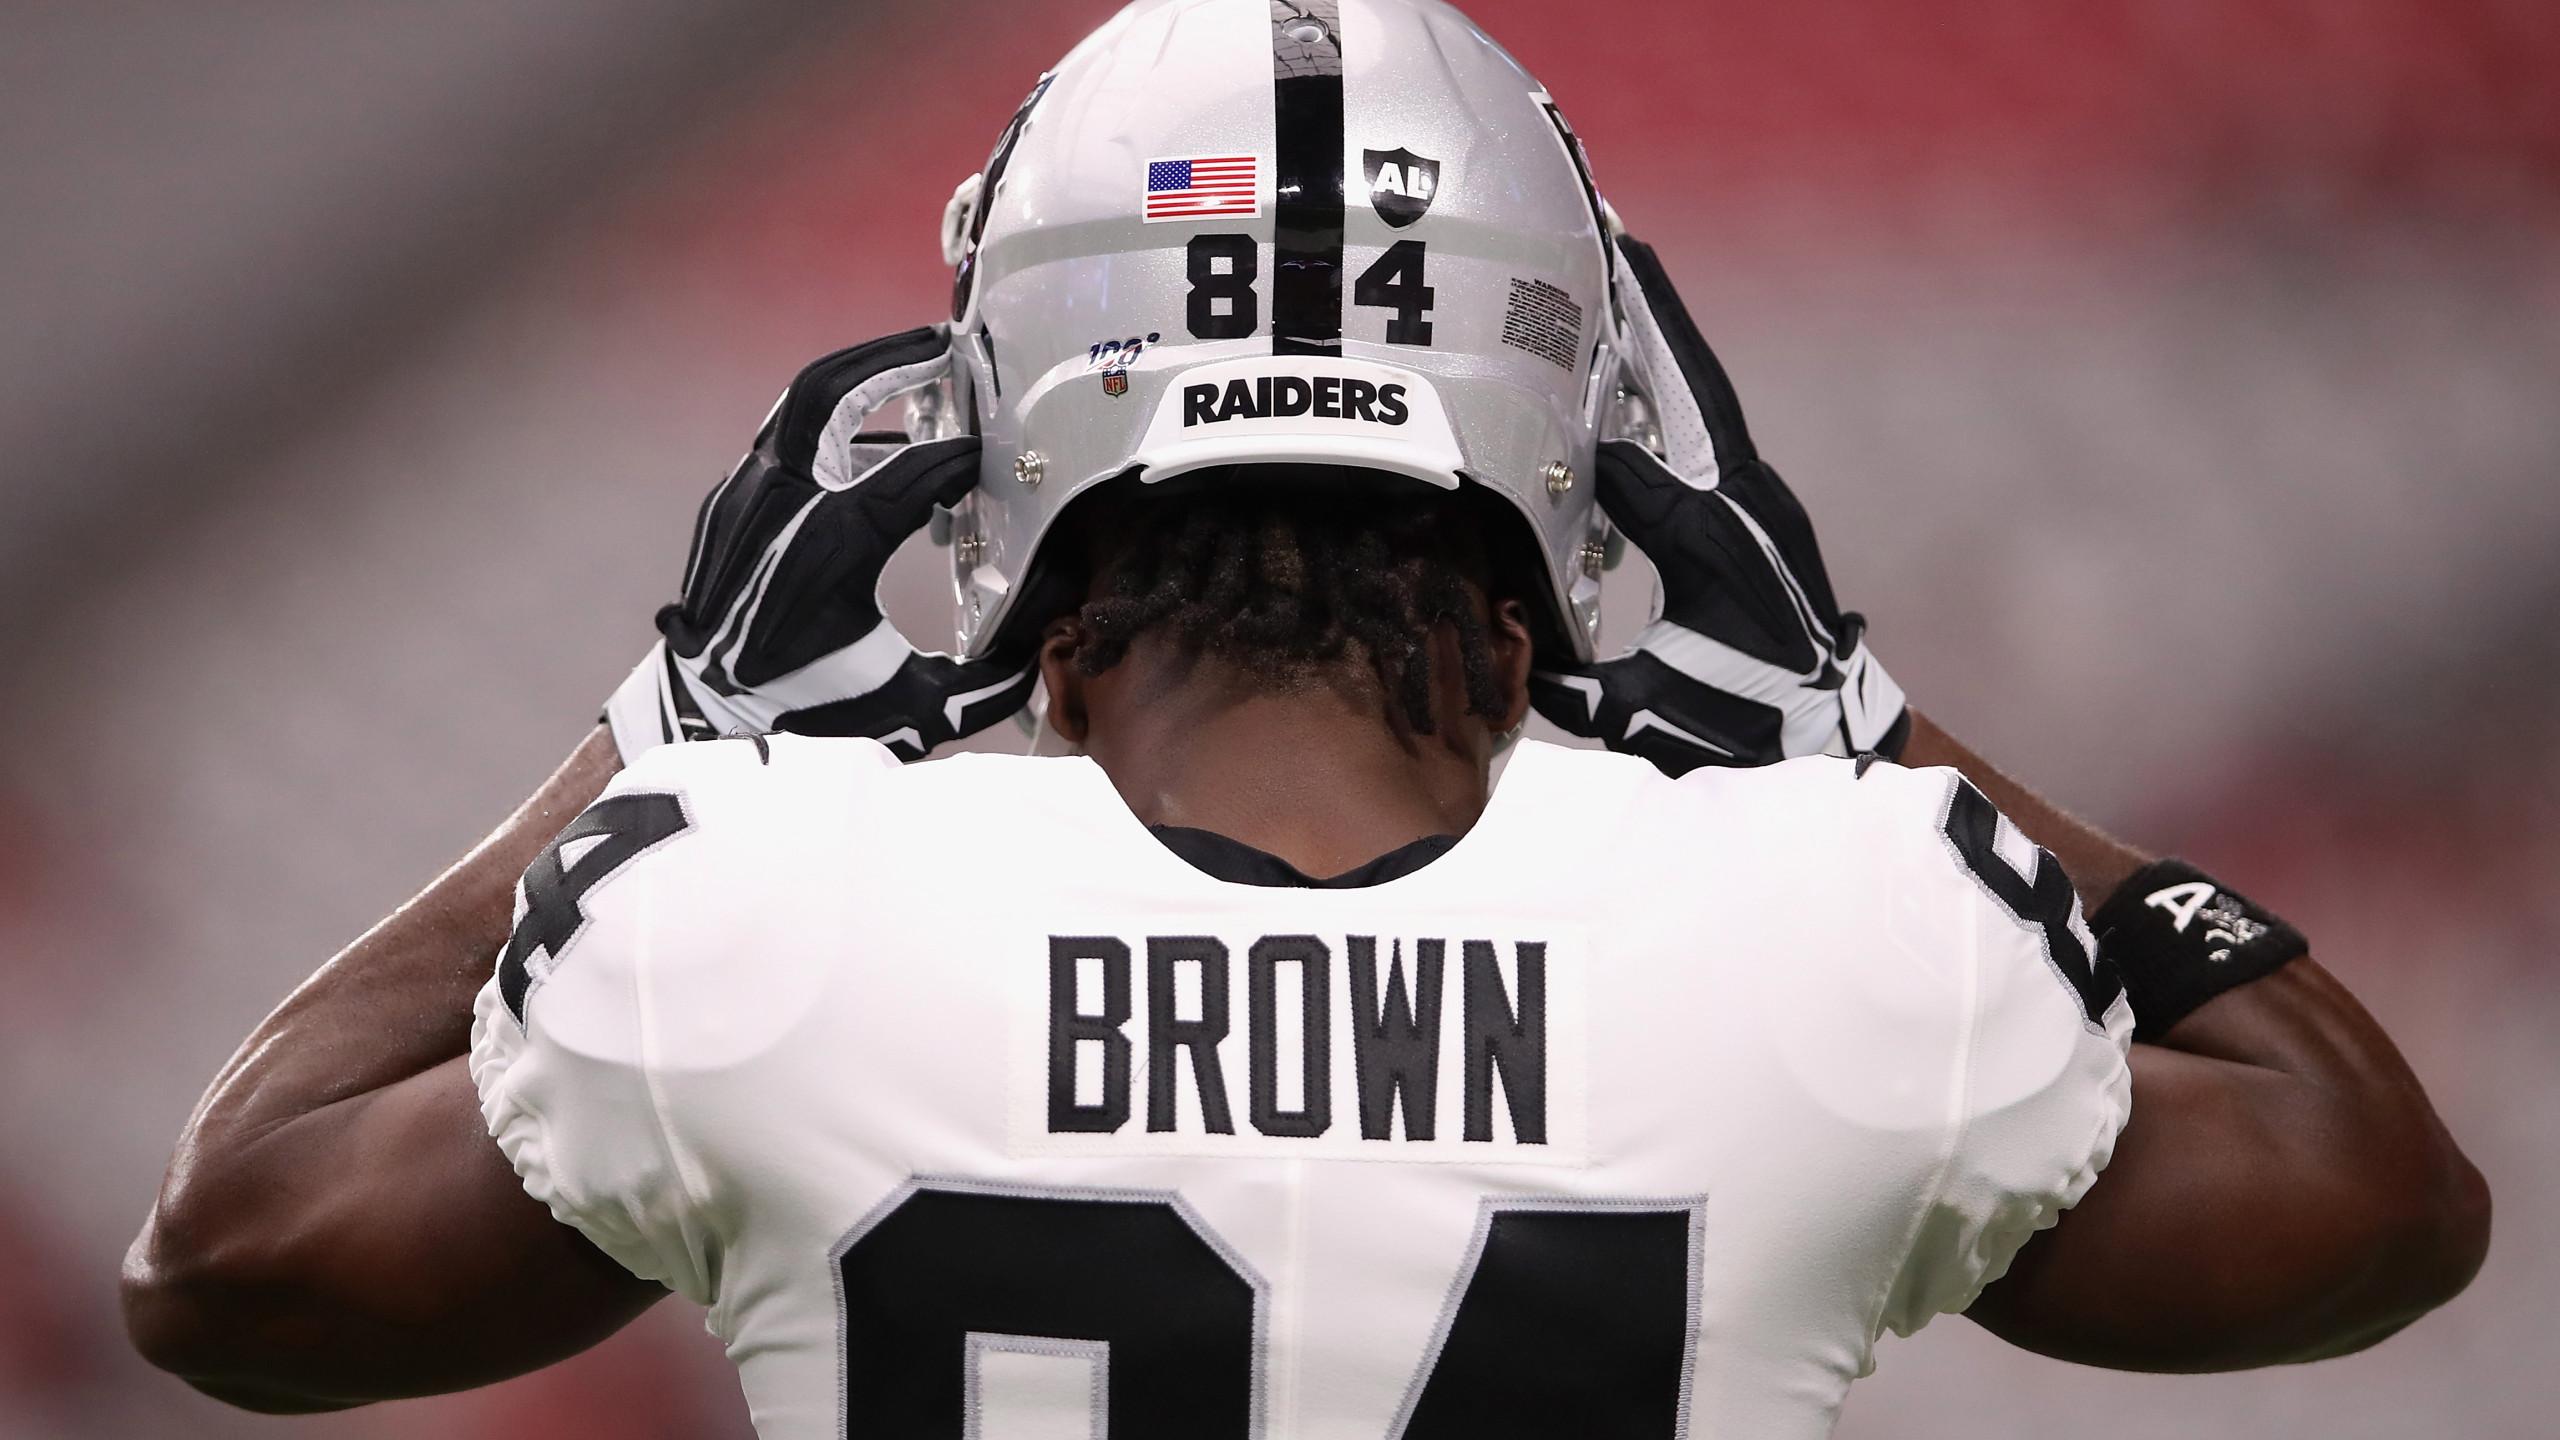 Raiders release WR Antonio Brown following Instagram post